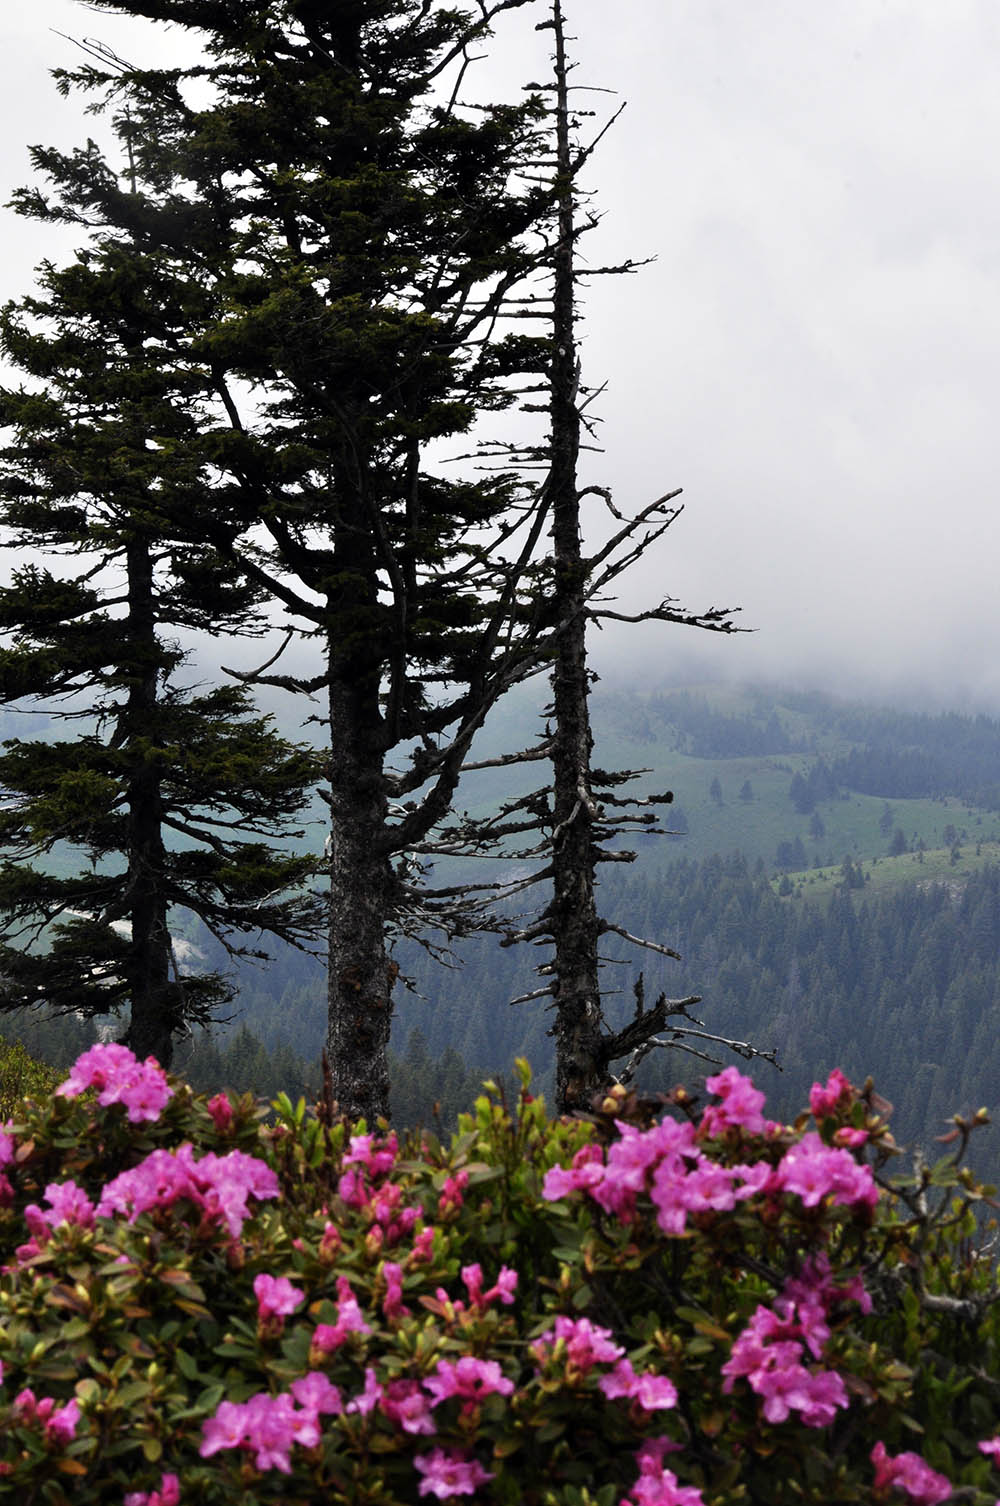 066.3. Vasile Andreea Nicoleta. Rhododendron printre nori (Muntele Rosu, Prahova)